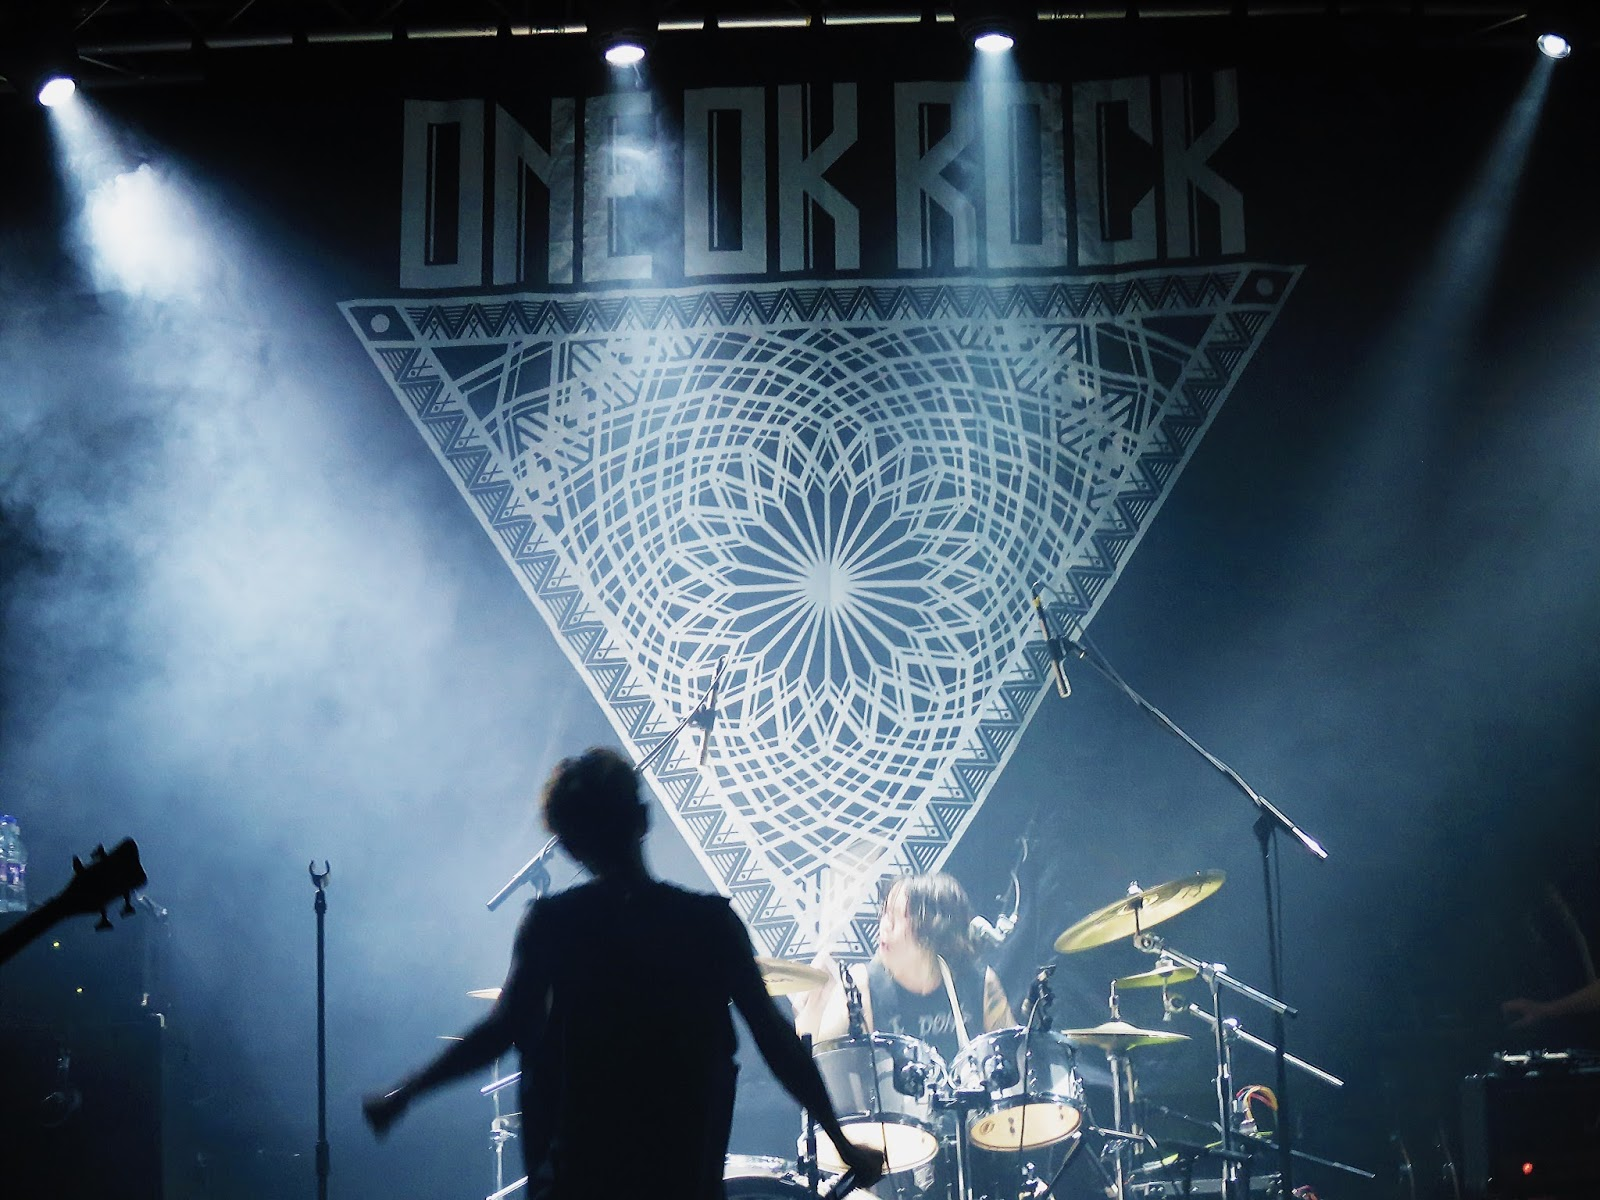 one ok rock live uk tour 2015